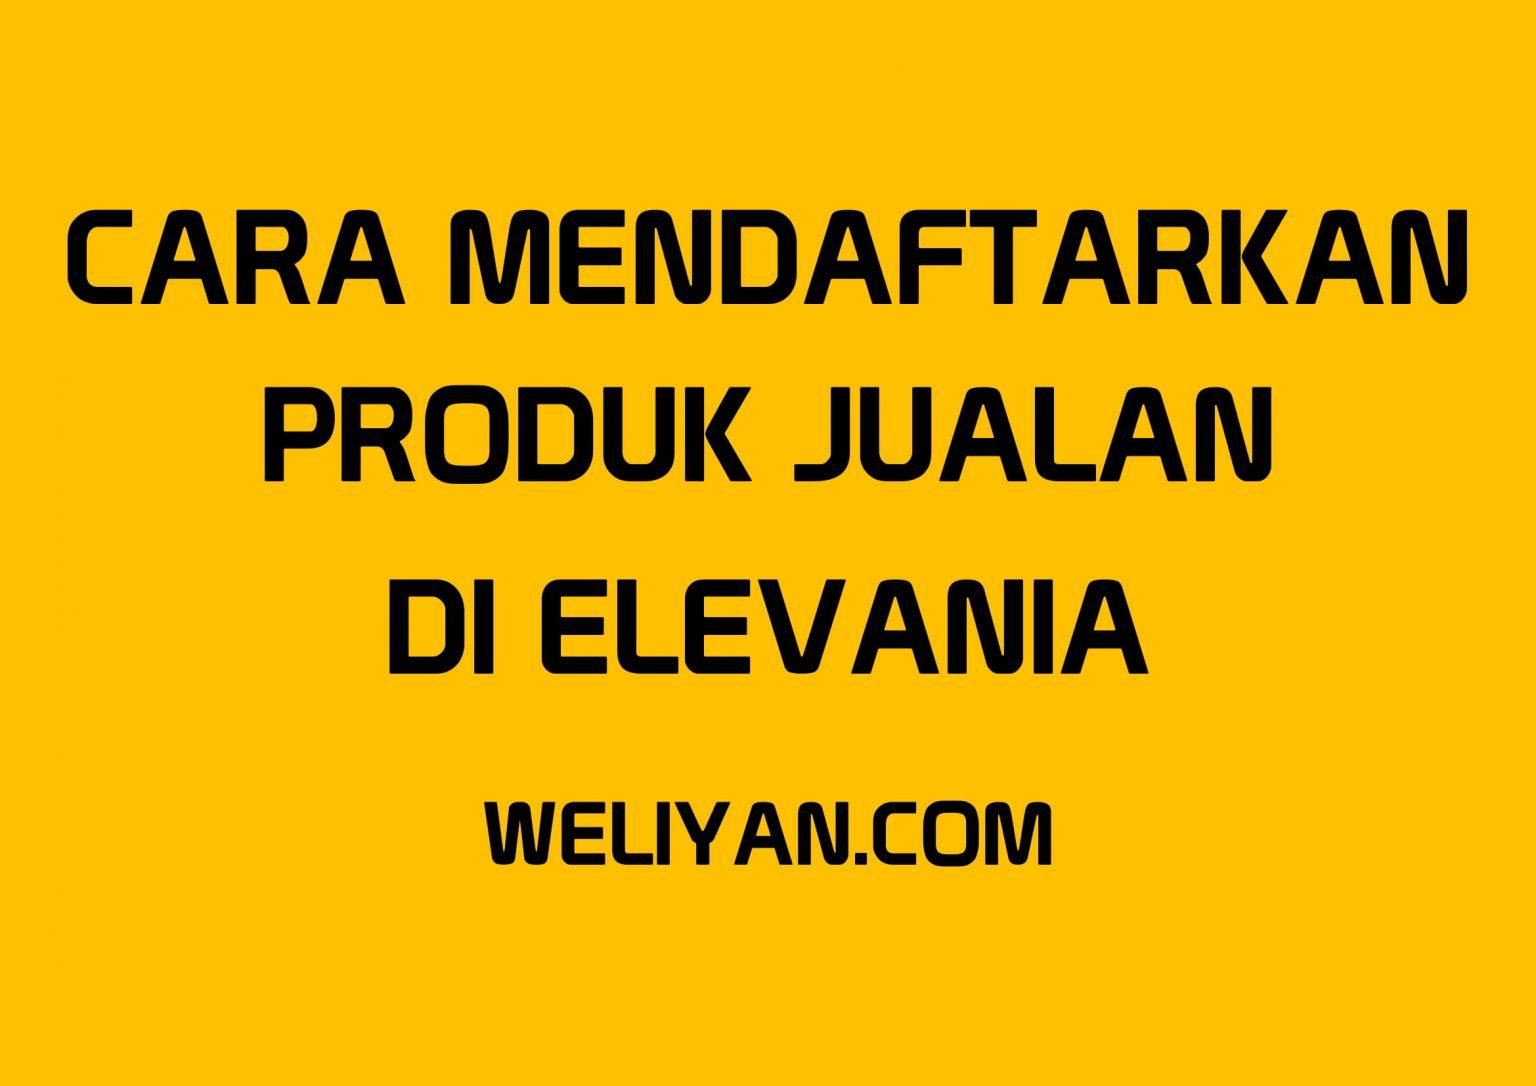 Bagaimana Cara Mendaftarkan Produk Jualan di Elevenia ...